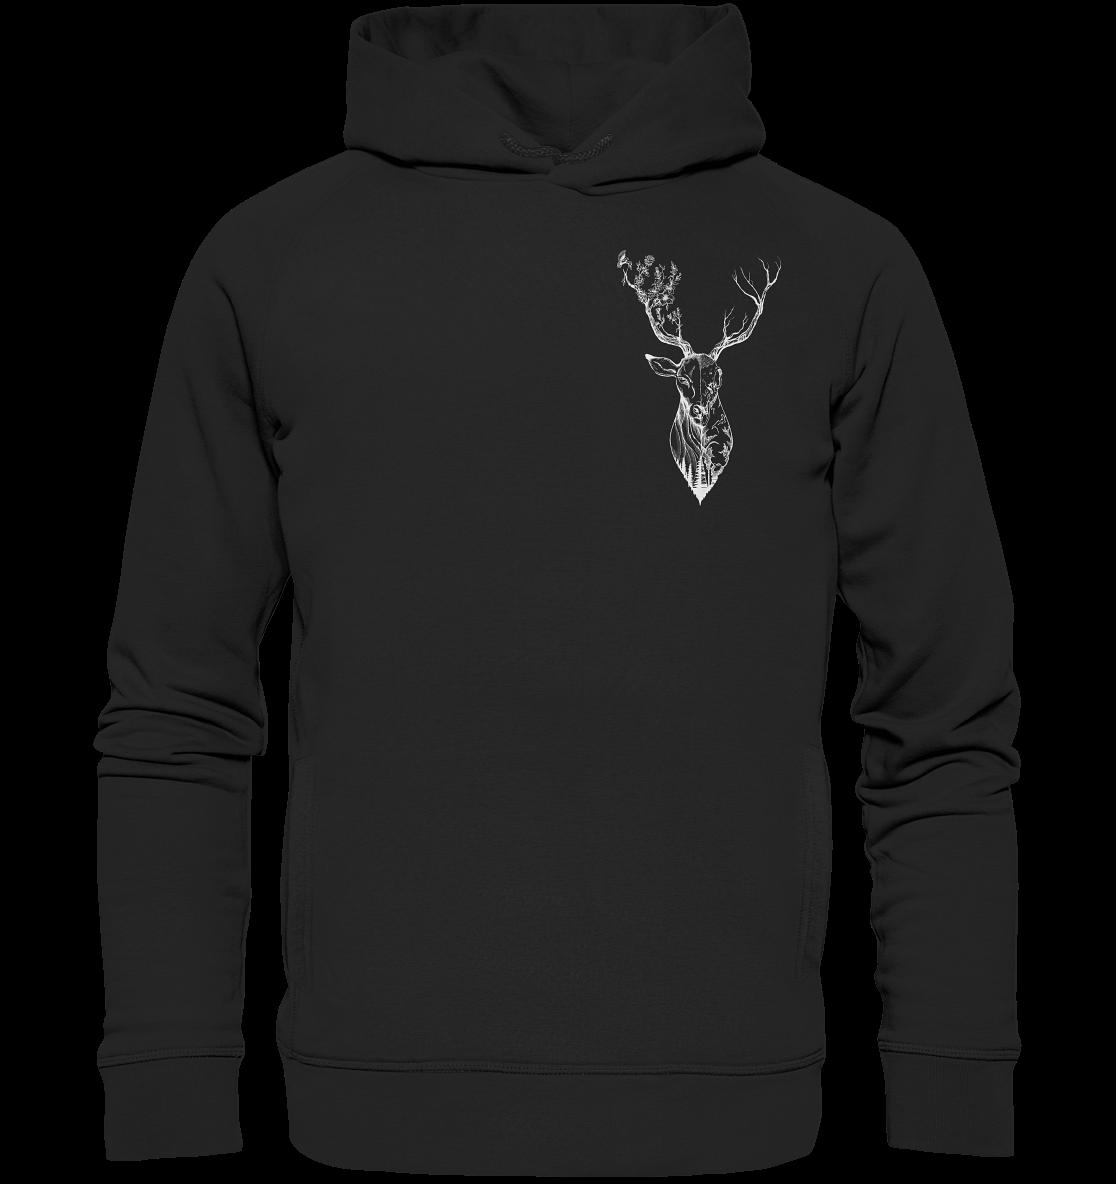 front-organic-fashion-hoodie-272727-1116x-6.png